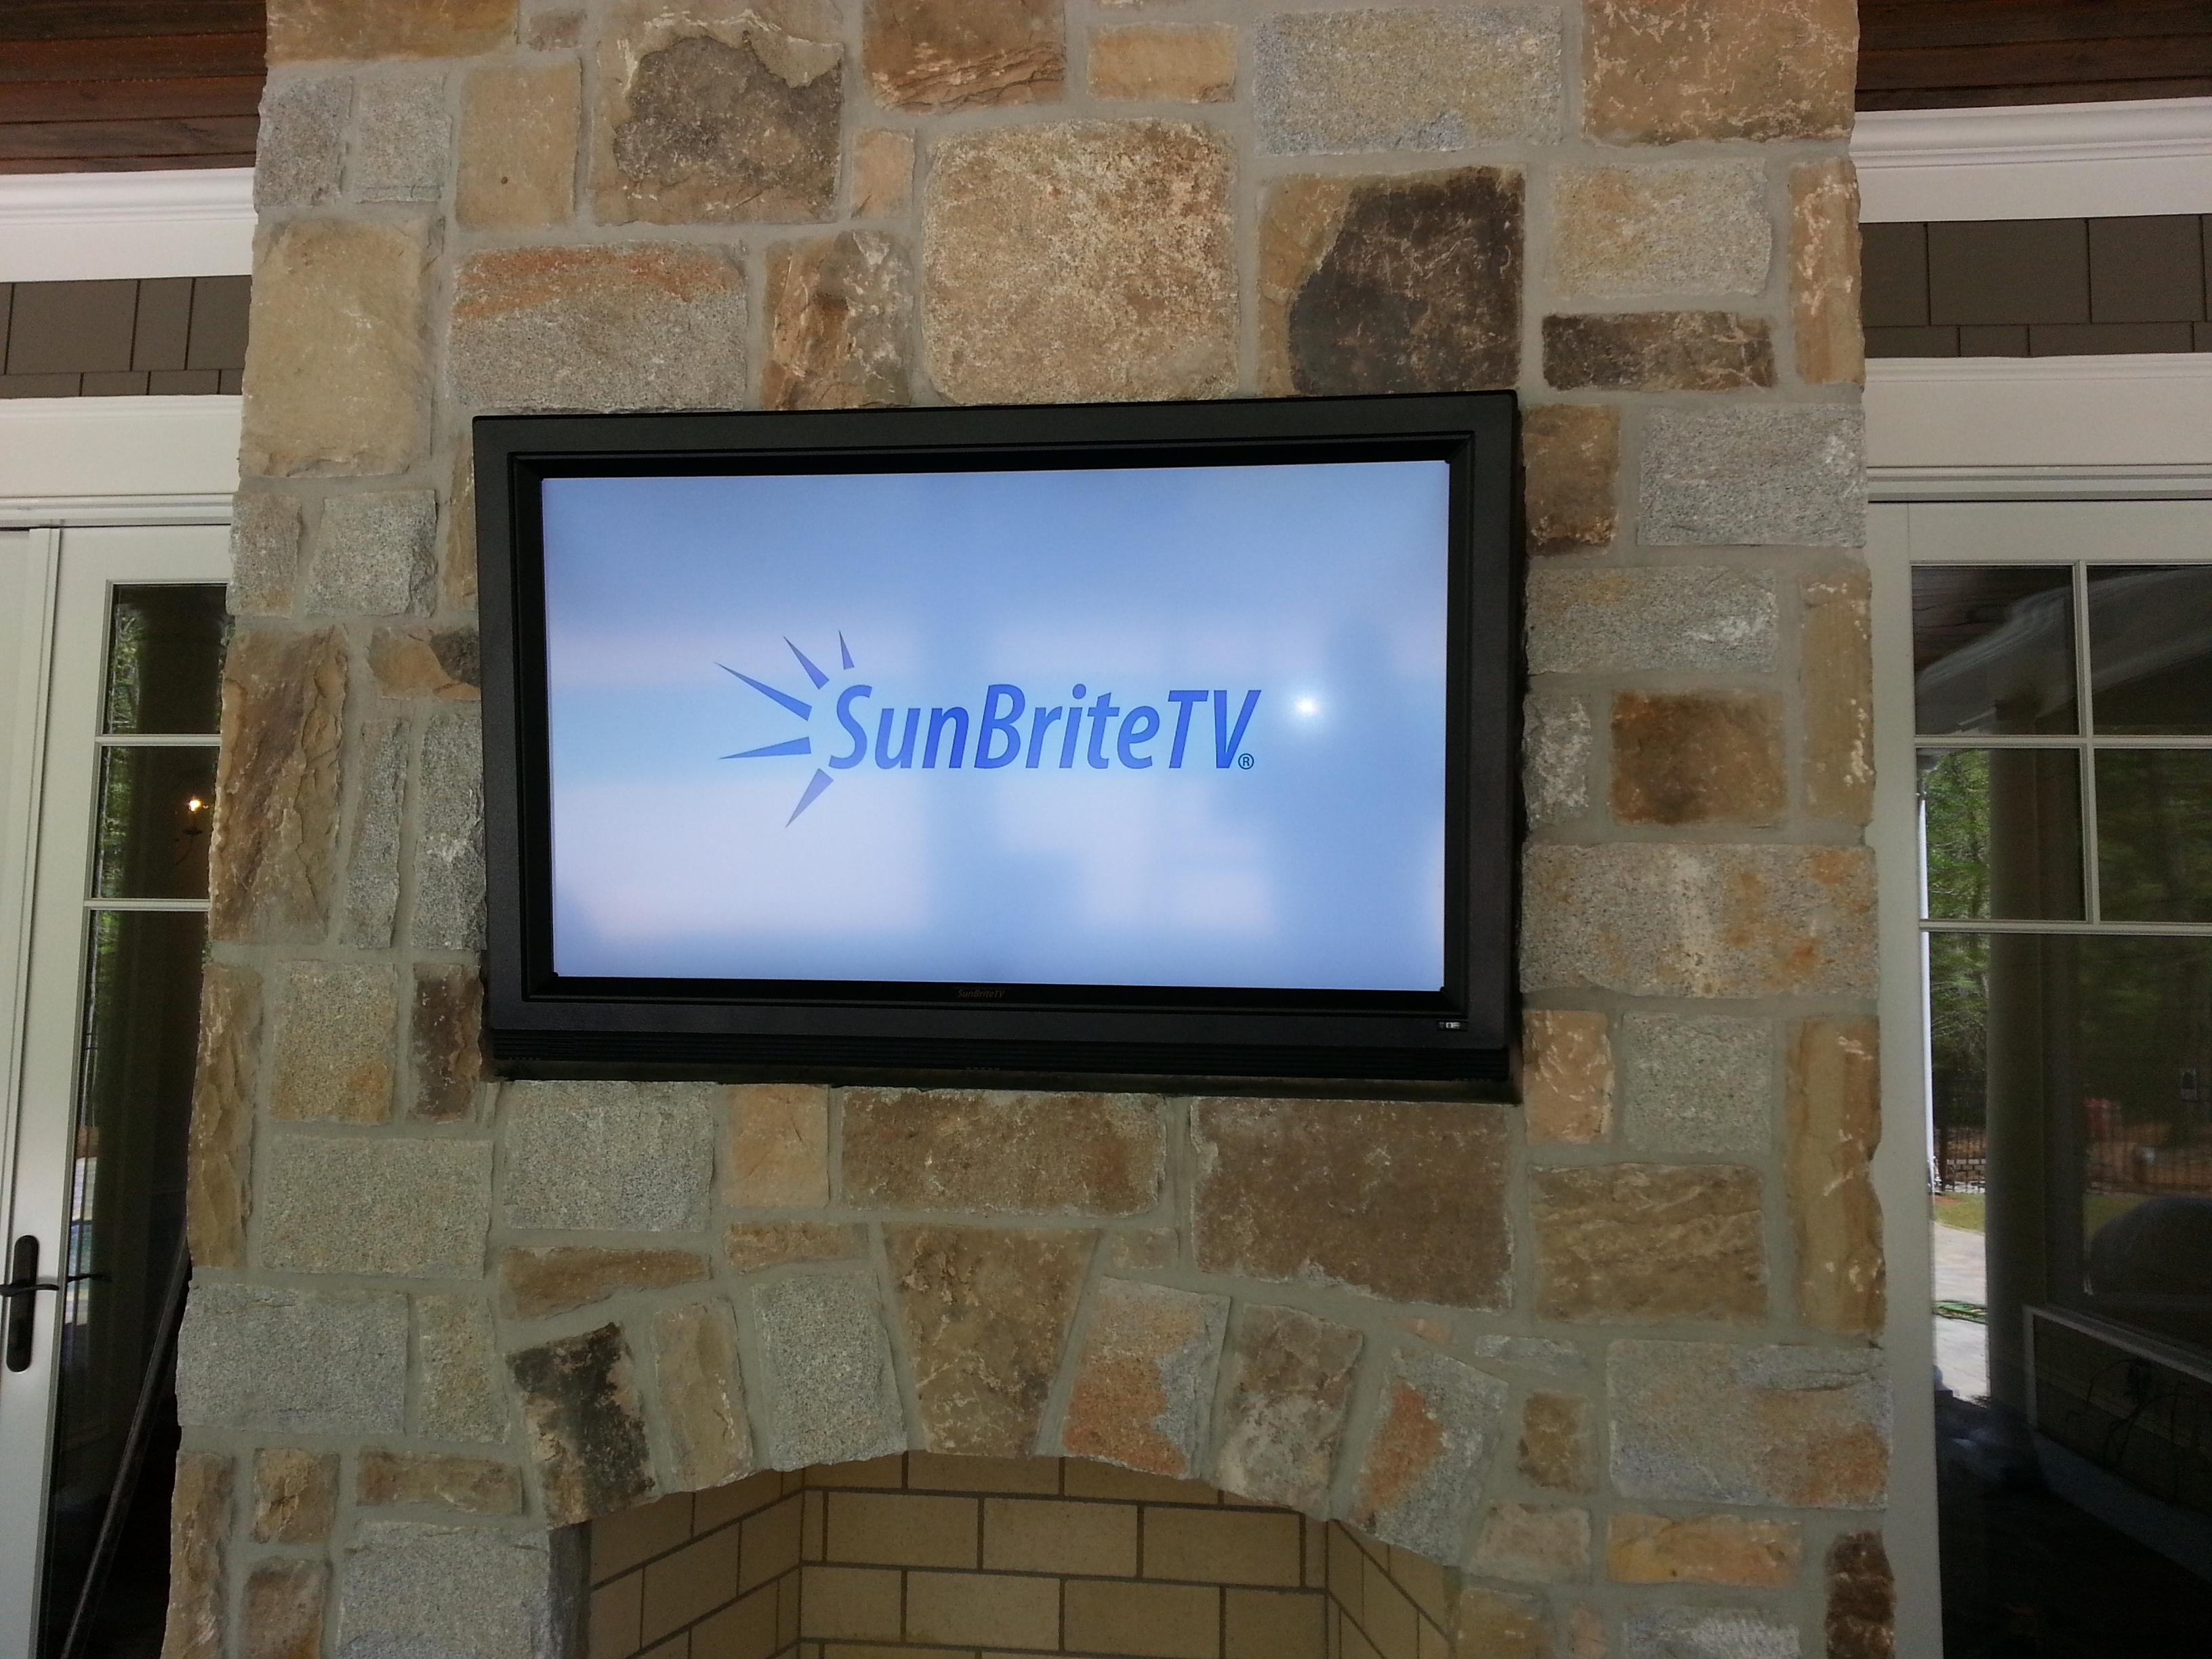 Sunbrite TV install